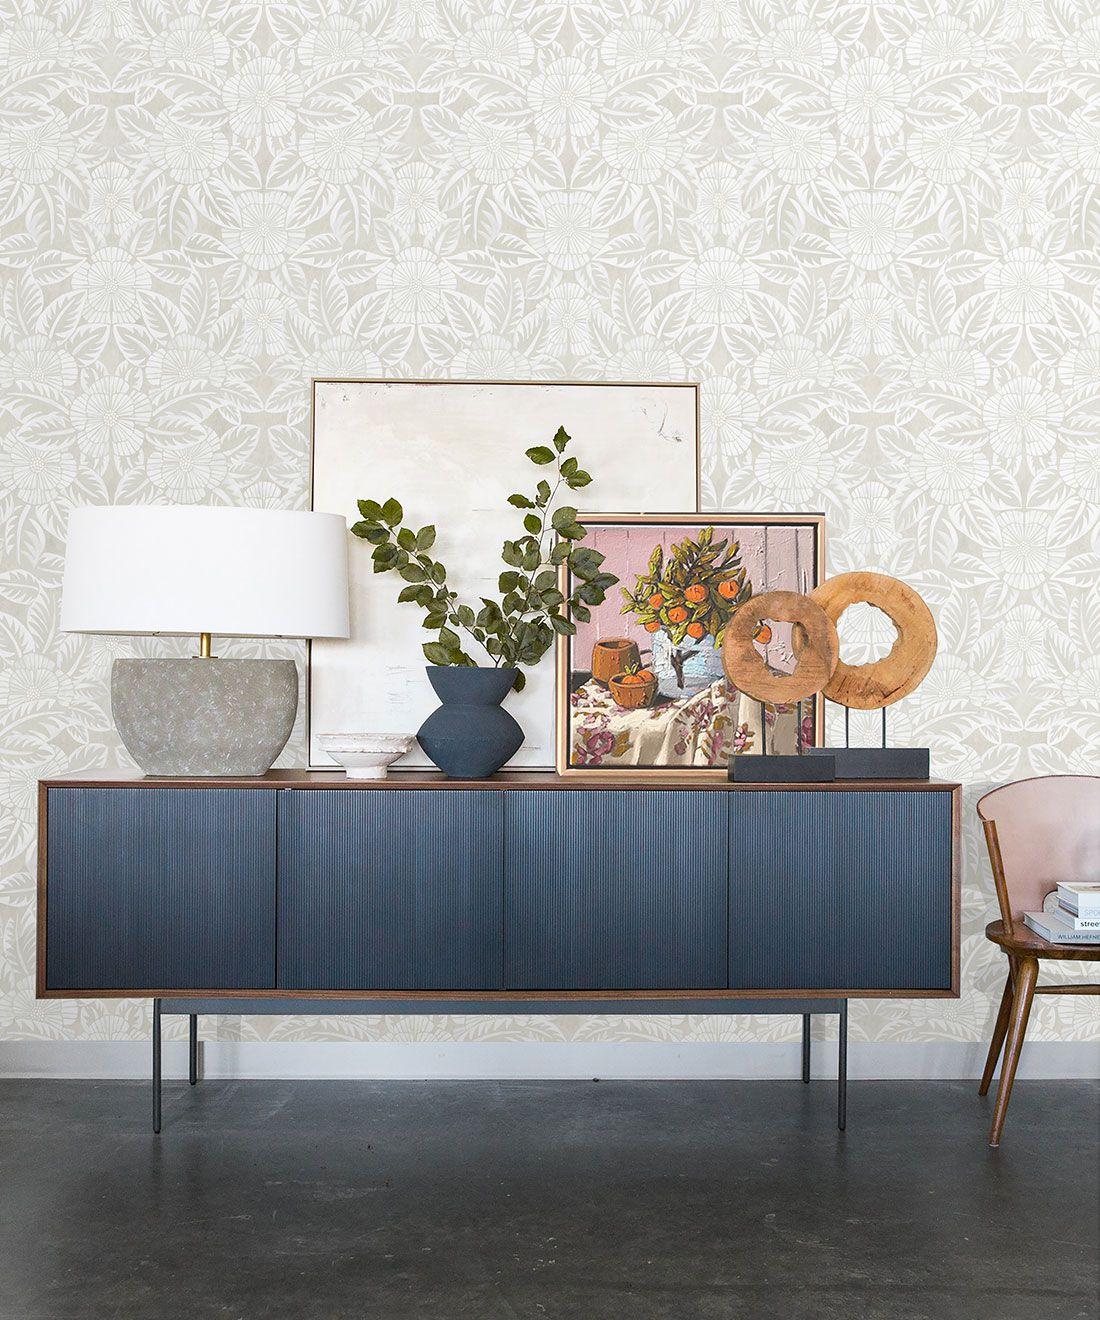 Calcutta Wallpaper • Flower and Leaf Motif Design • Ethnic Wallpaper • Beige Wallpaper • Insitu